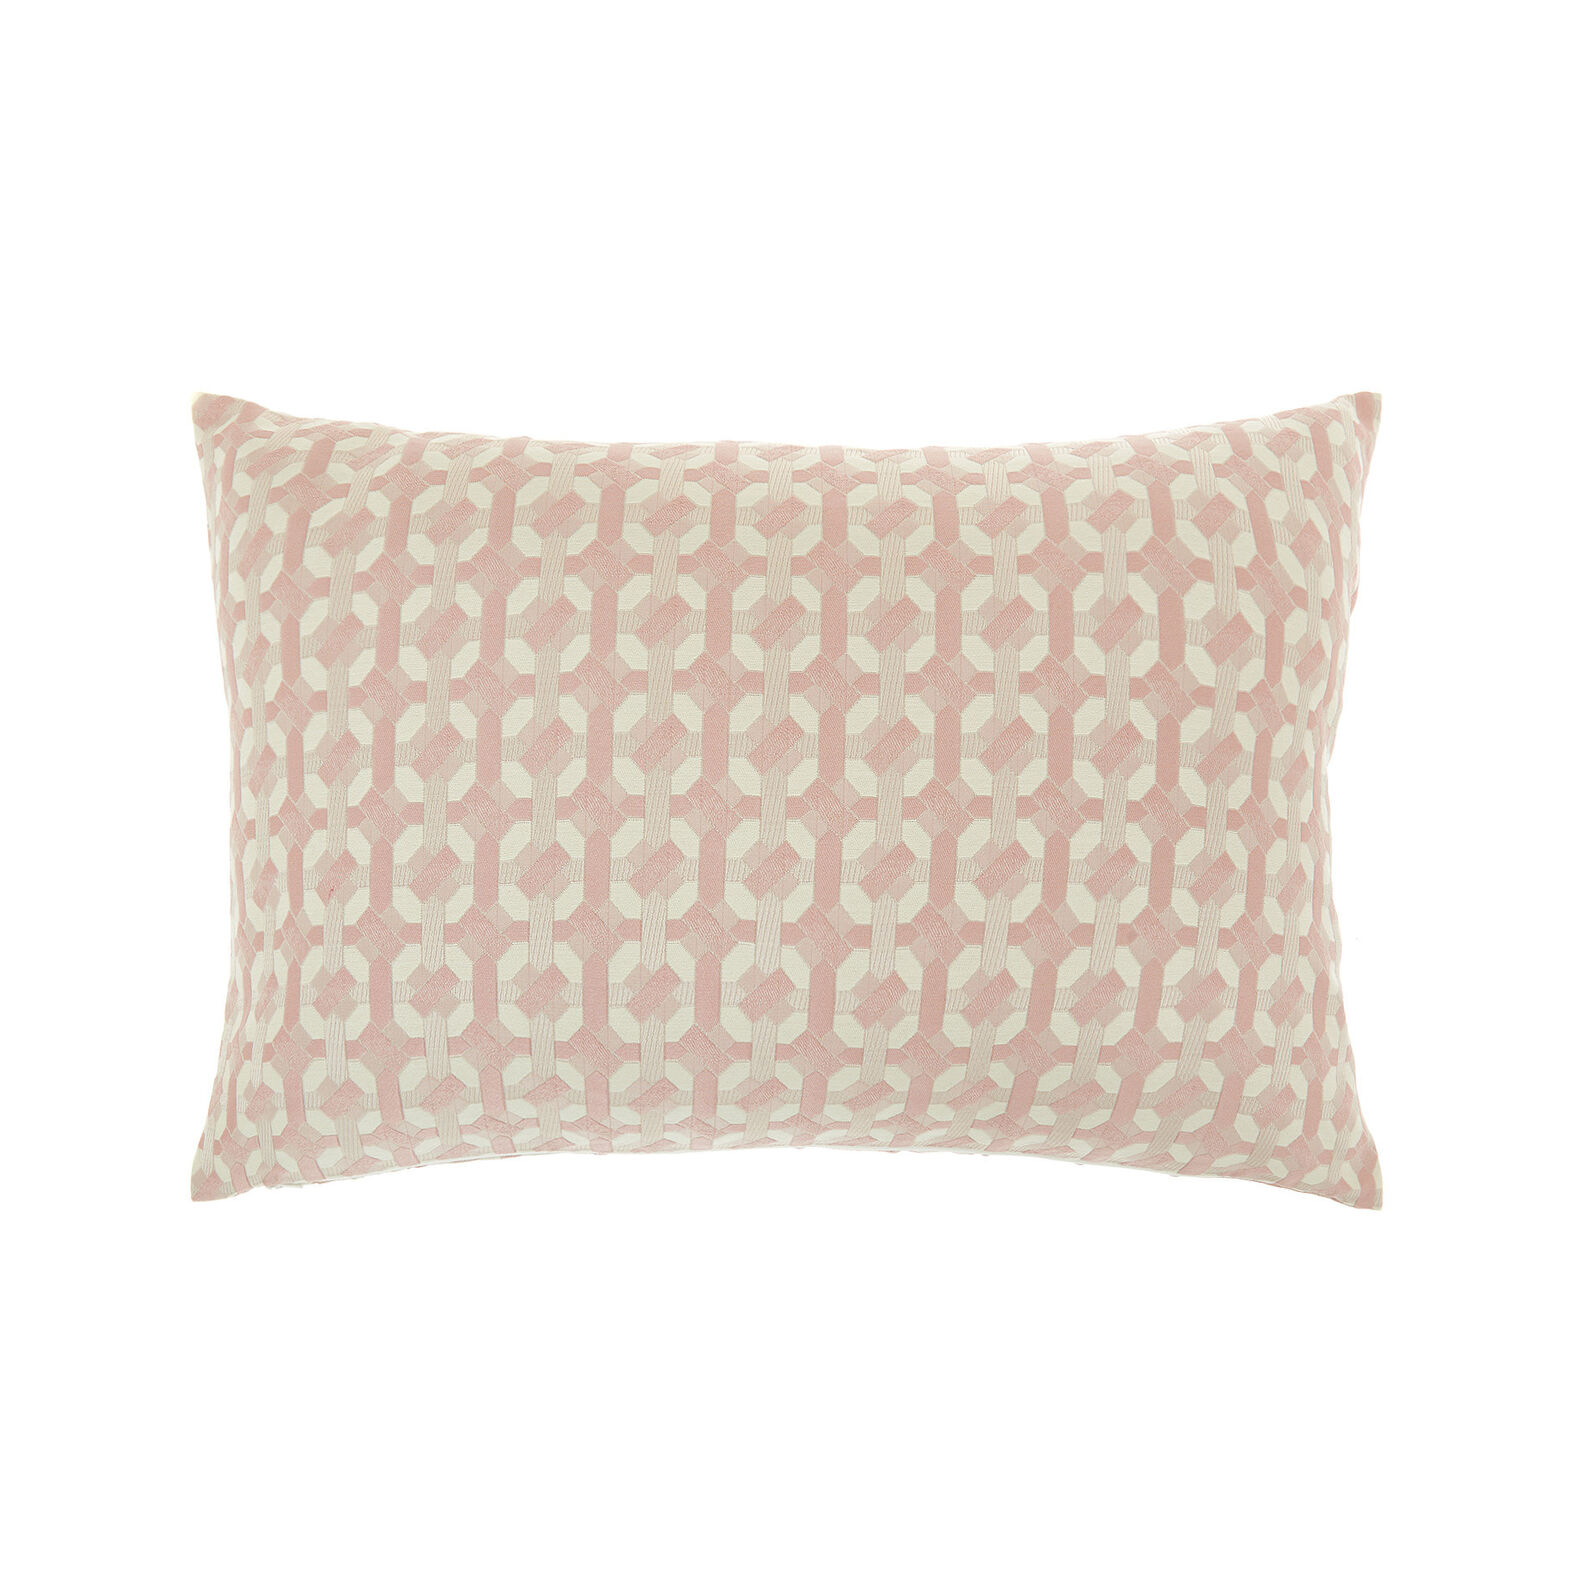 Jacquard weave cushion (35x55cm)